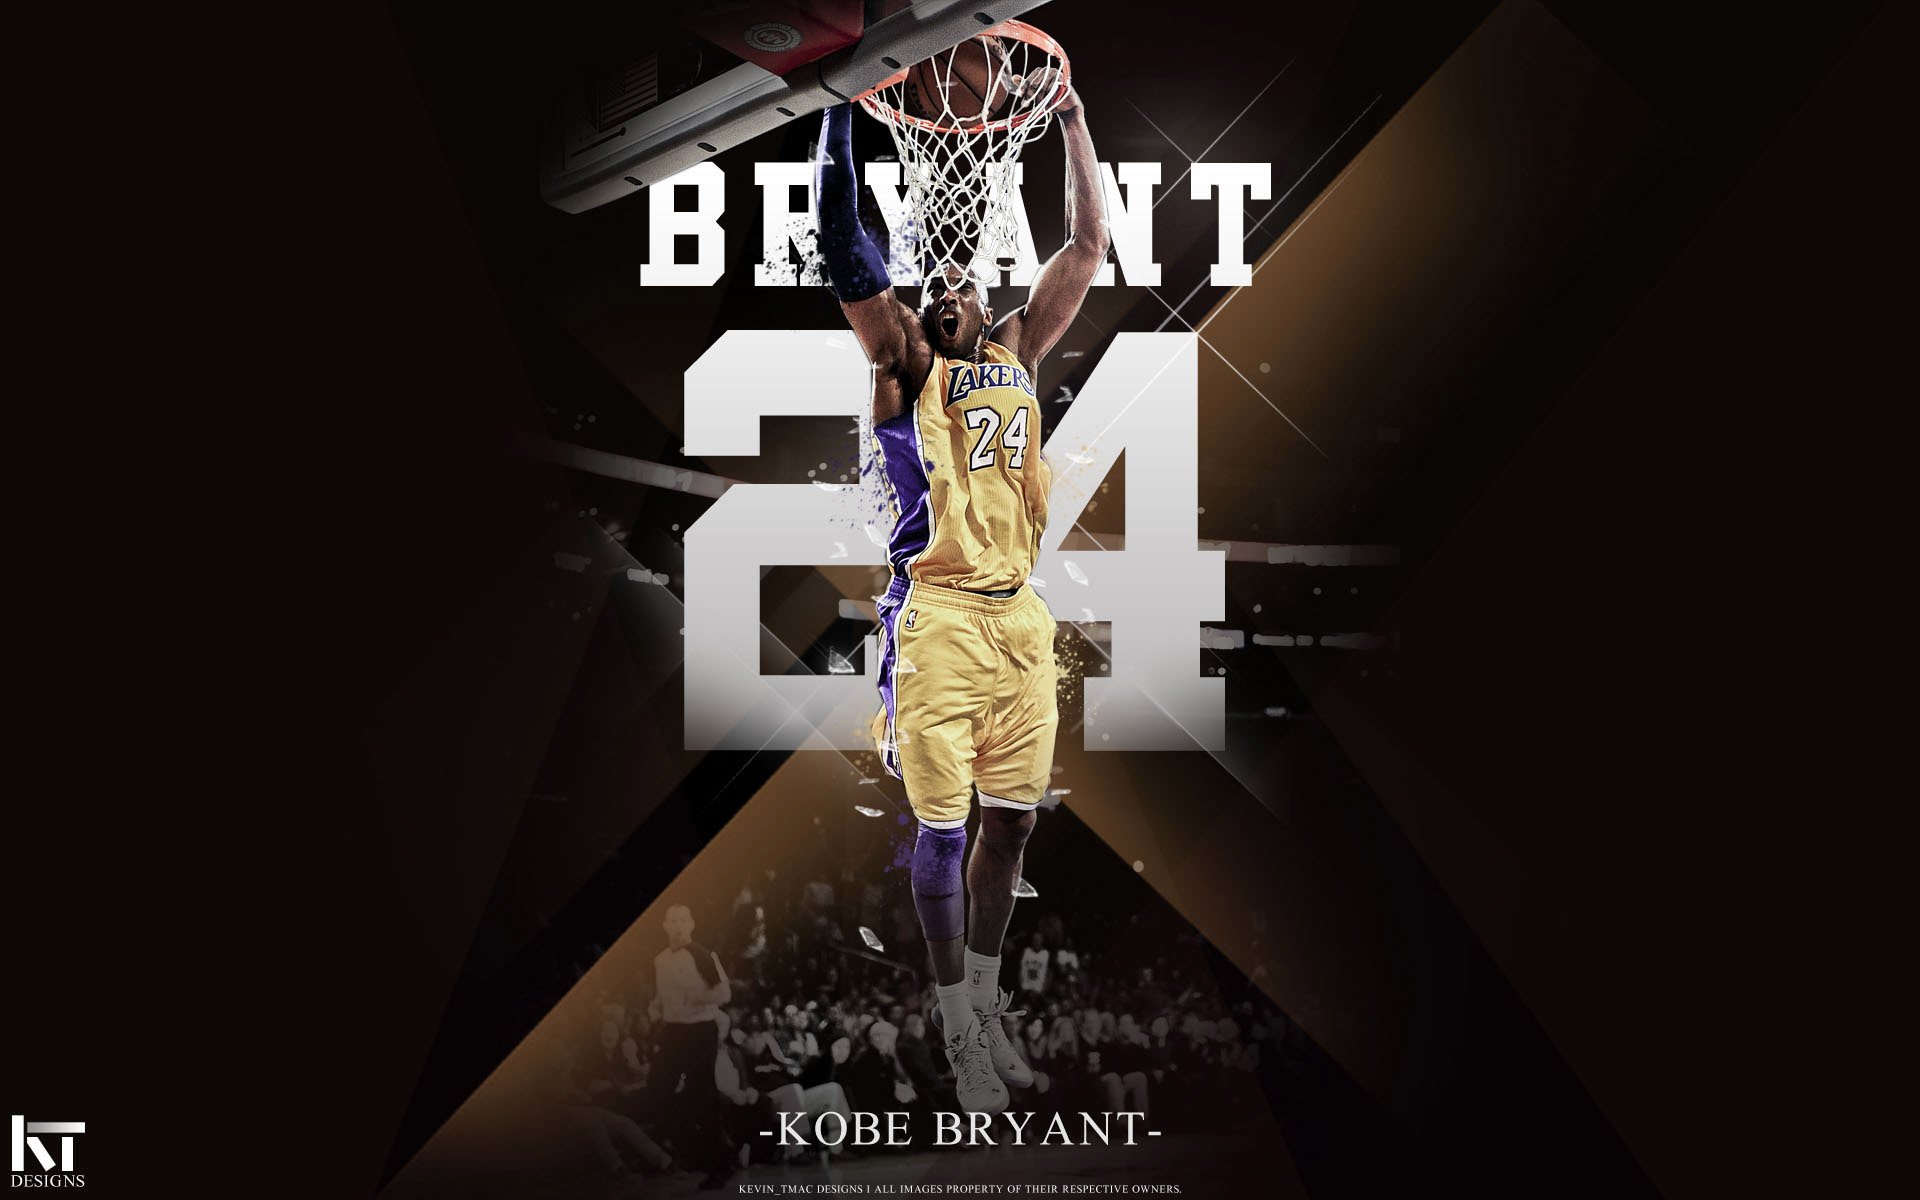 Kobe Bryant Wallpaper Wide On Wallpaper Hd 1920 X 1200 Black Mamba Wallpaper Kobe Bryant 1920x1200 Wallpaper Teahub Io